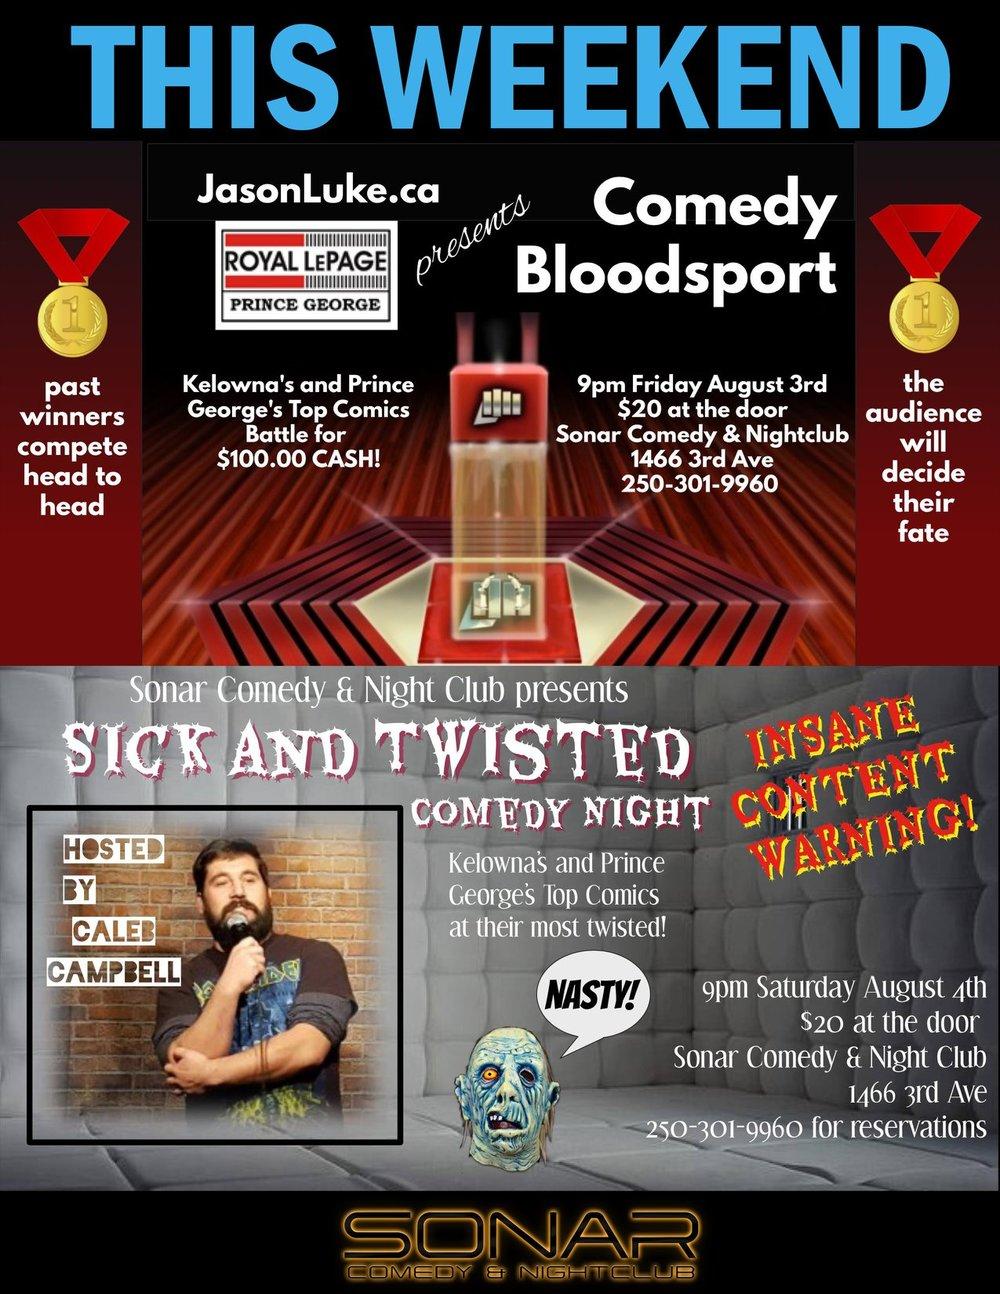 Comedy Bloodsport.jpg